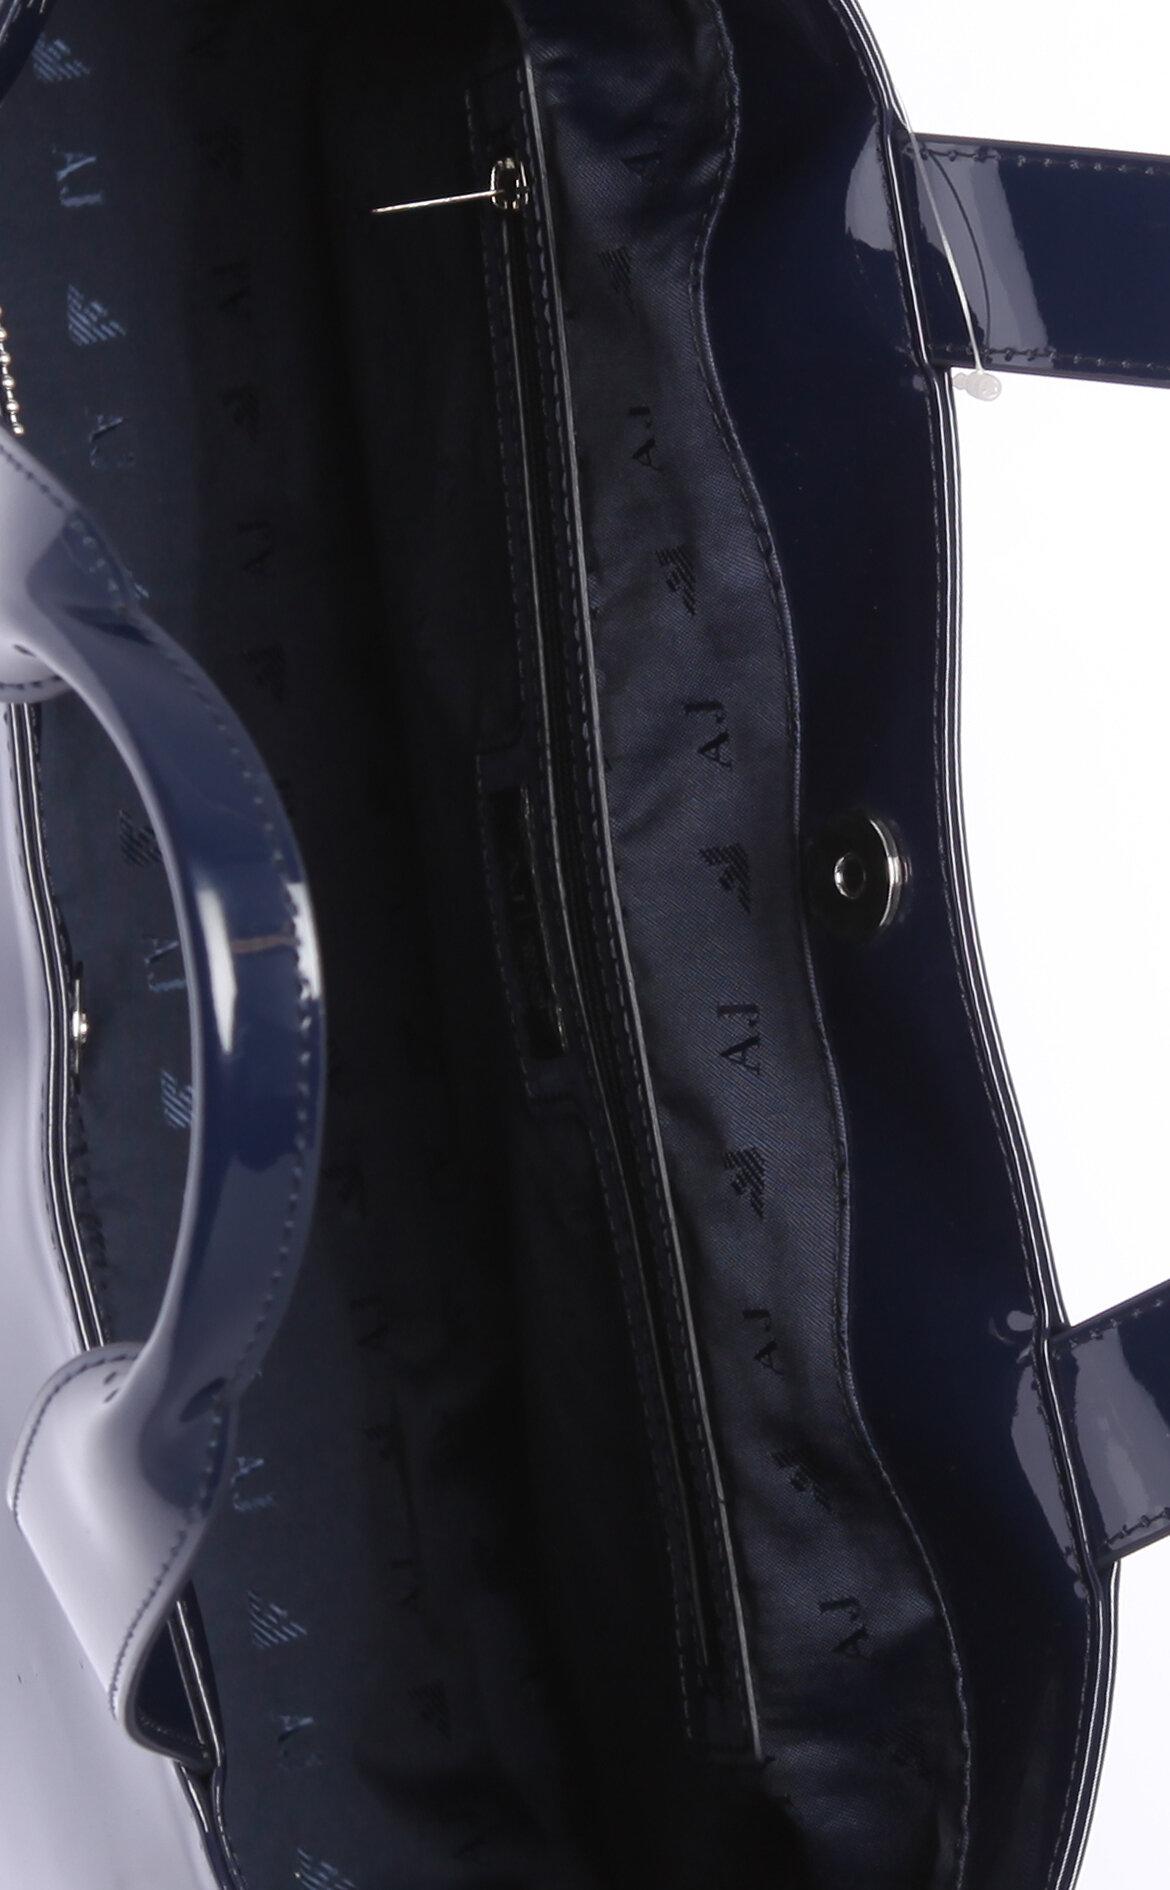 ffba19f79a2a9 Armani Jeans Kadın Mavi Çanta ARJ922591-CC85500335-BLUE - Brandroom